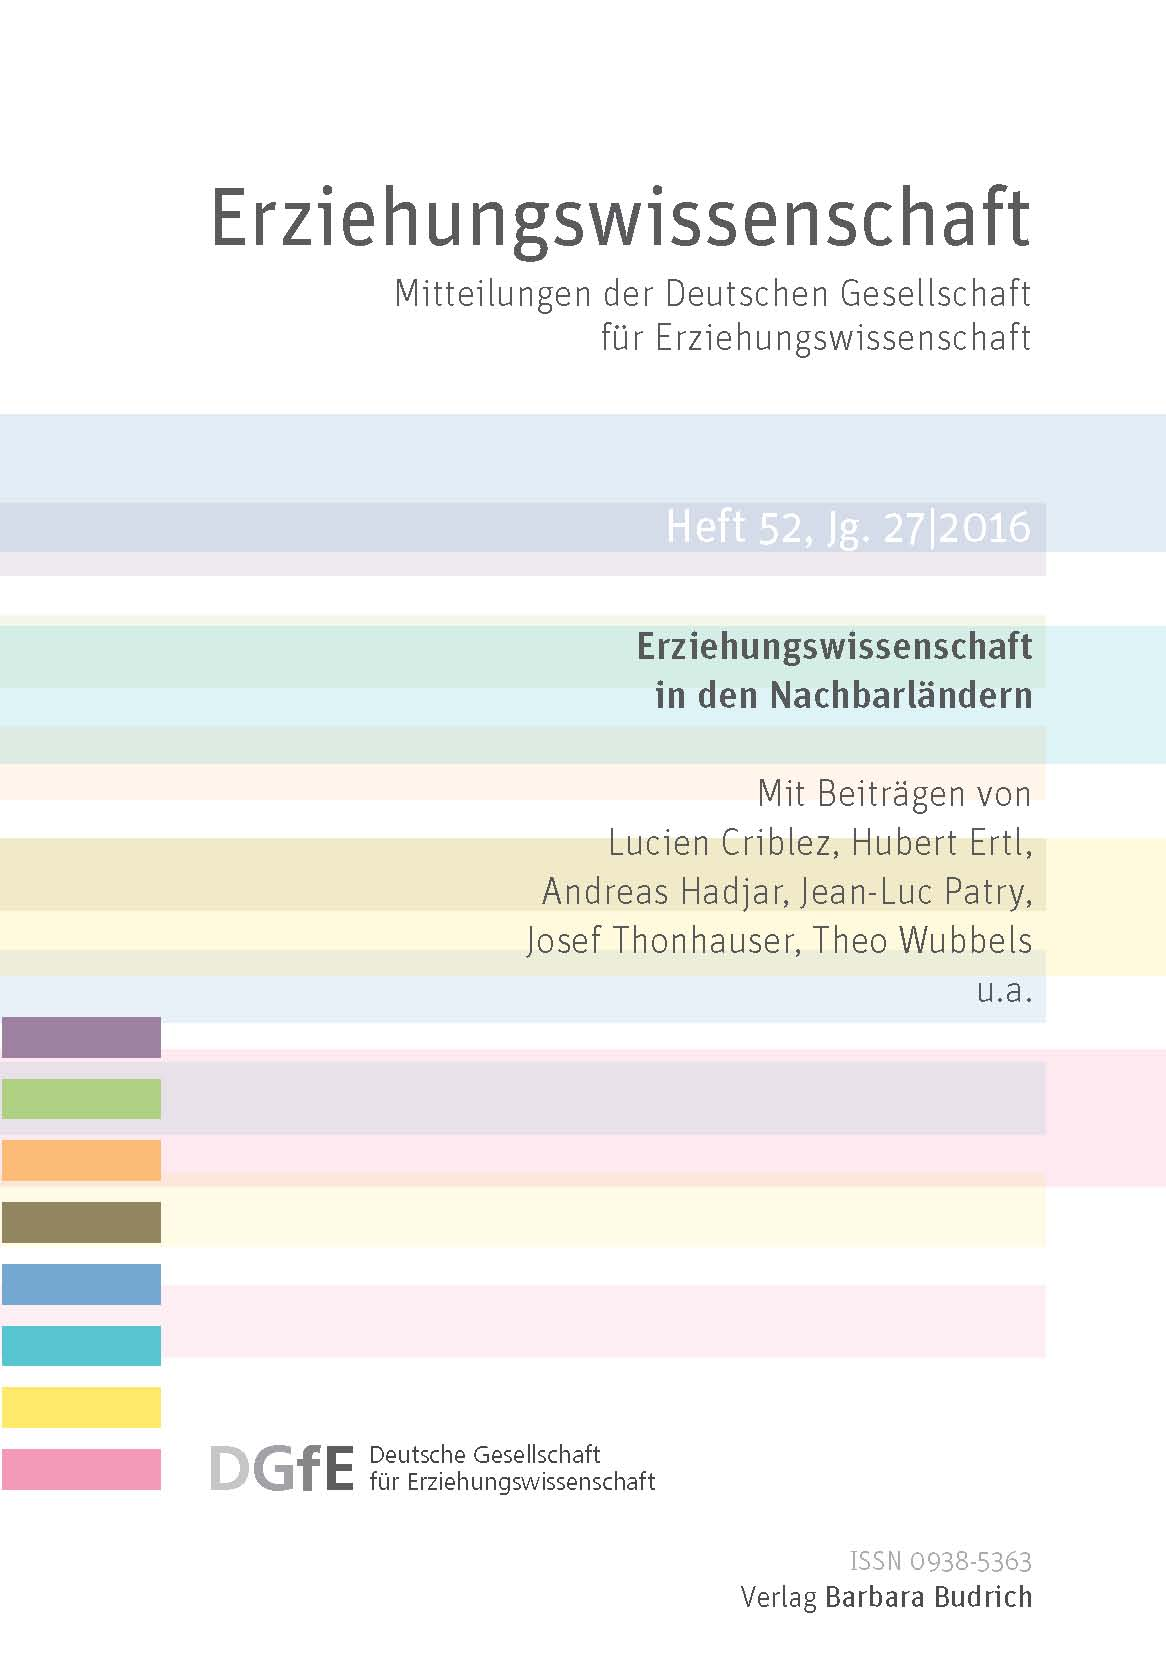 Erziehungswissenschaft 1-2016 (Heft 52) | Erziehungswissenschaft in den Nachbarländern